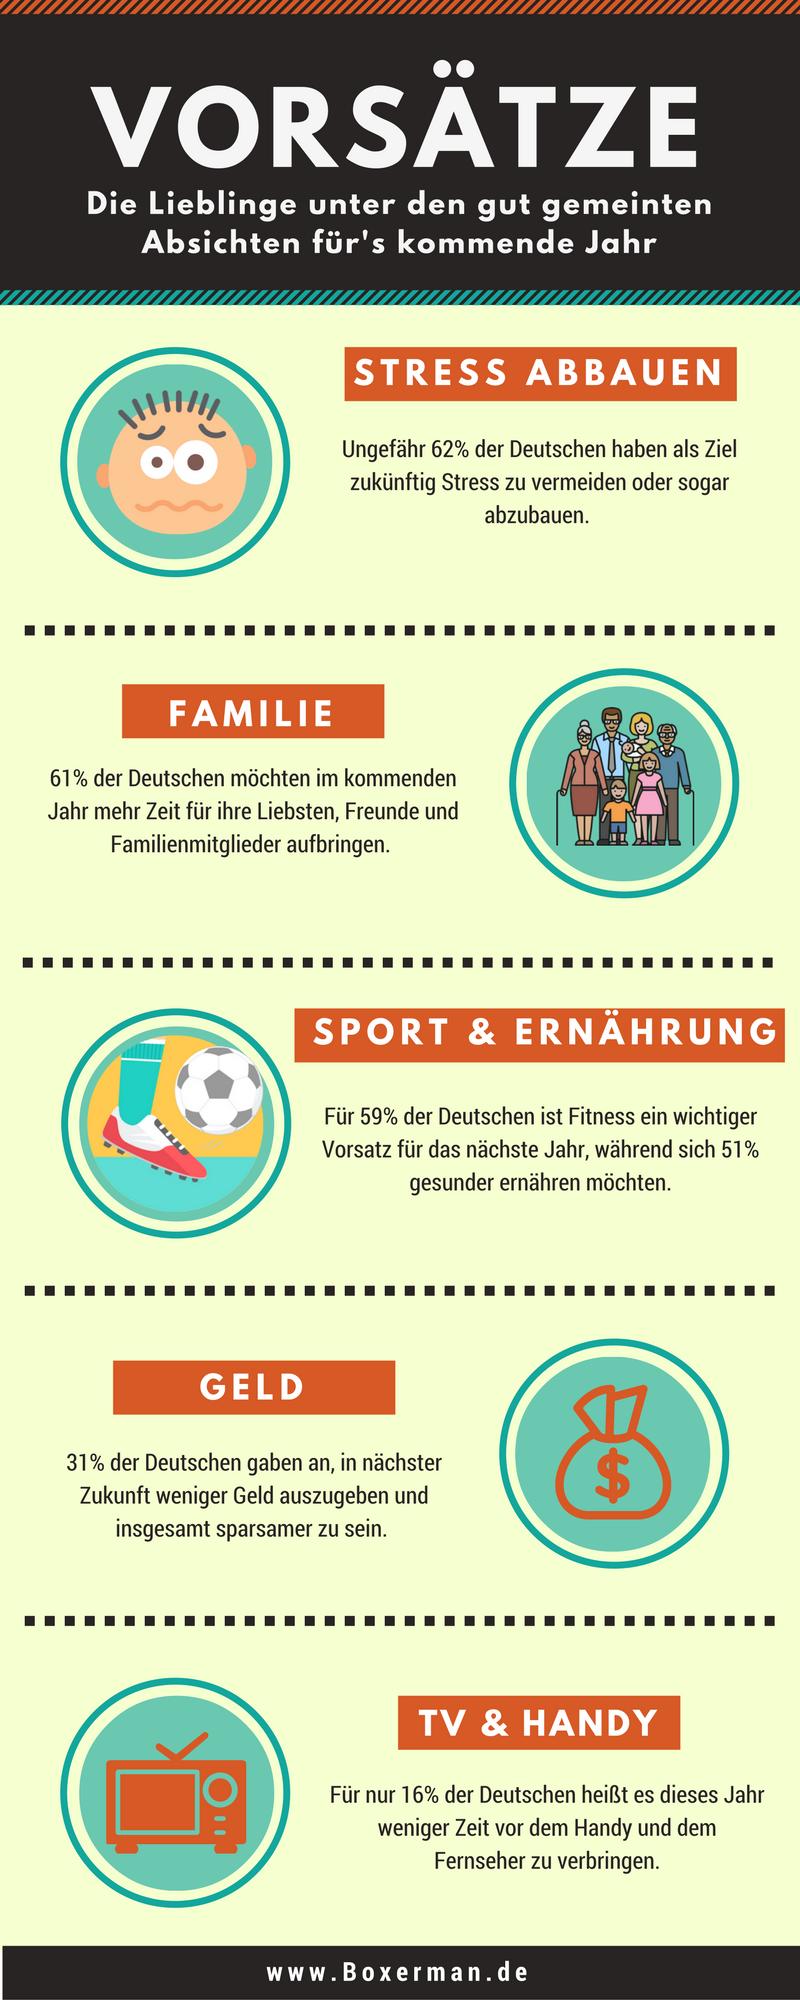 Vors-tze_Infografik